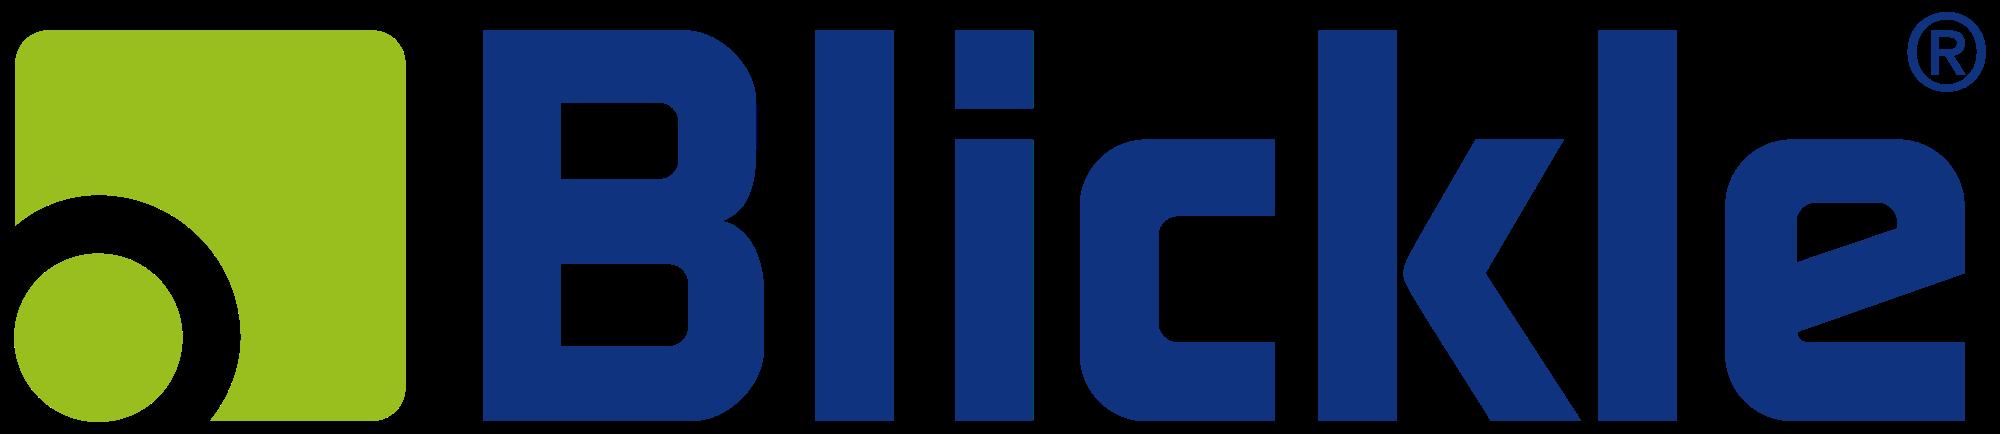 Blickle